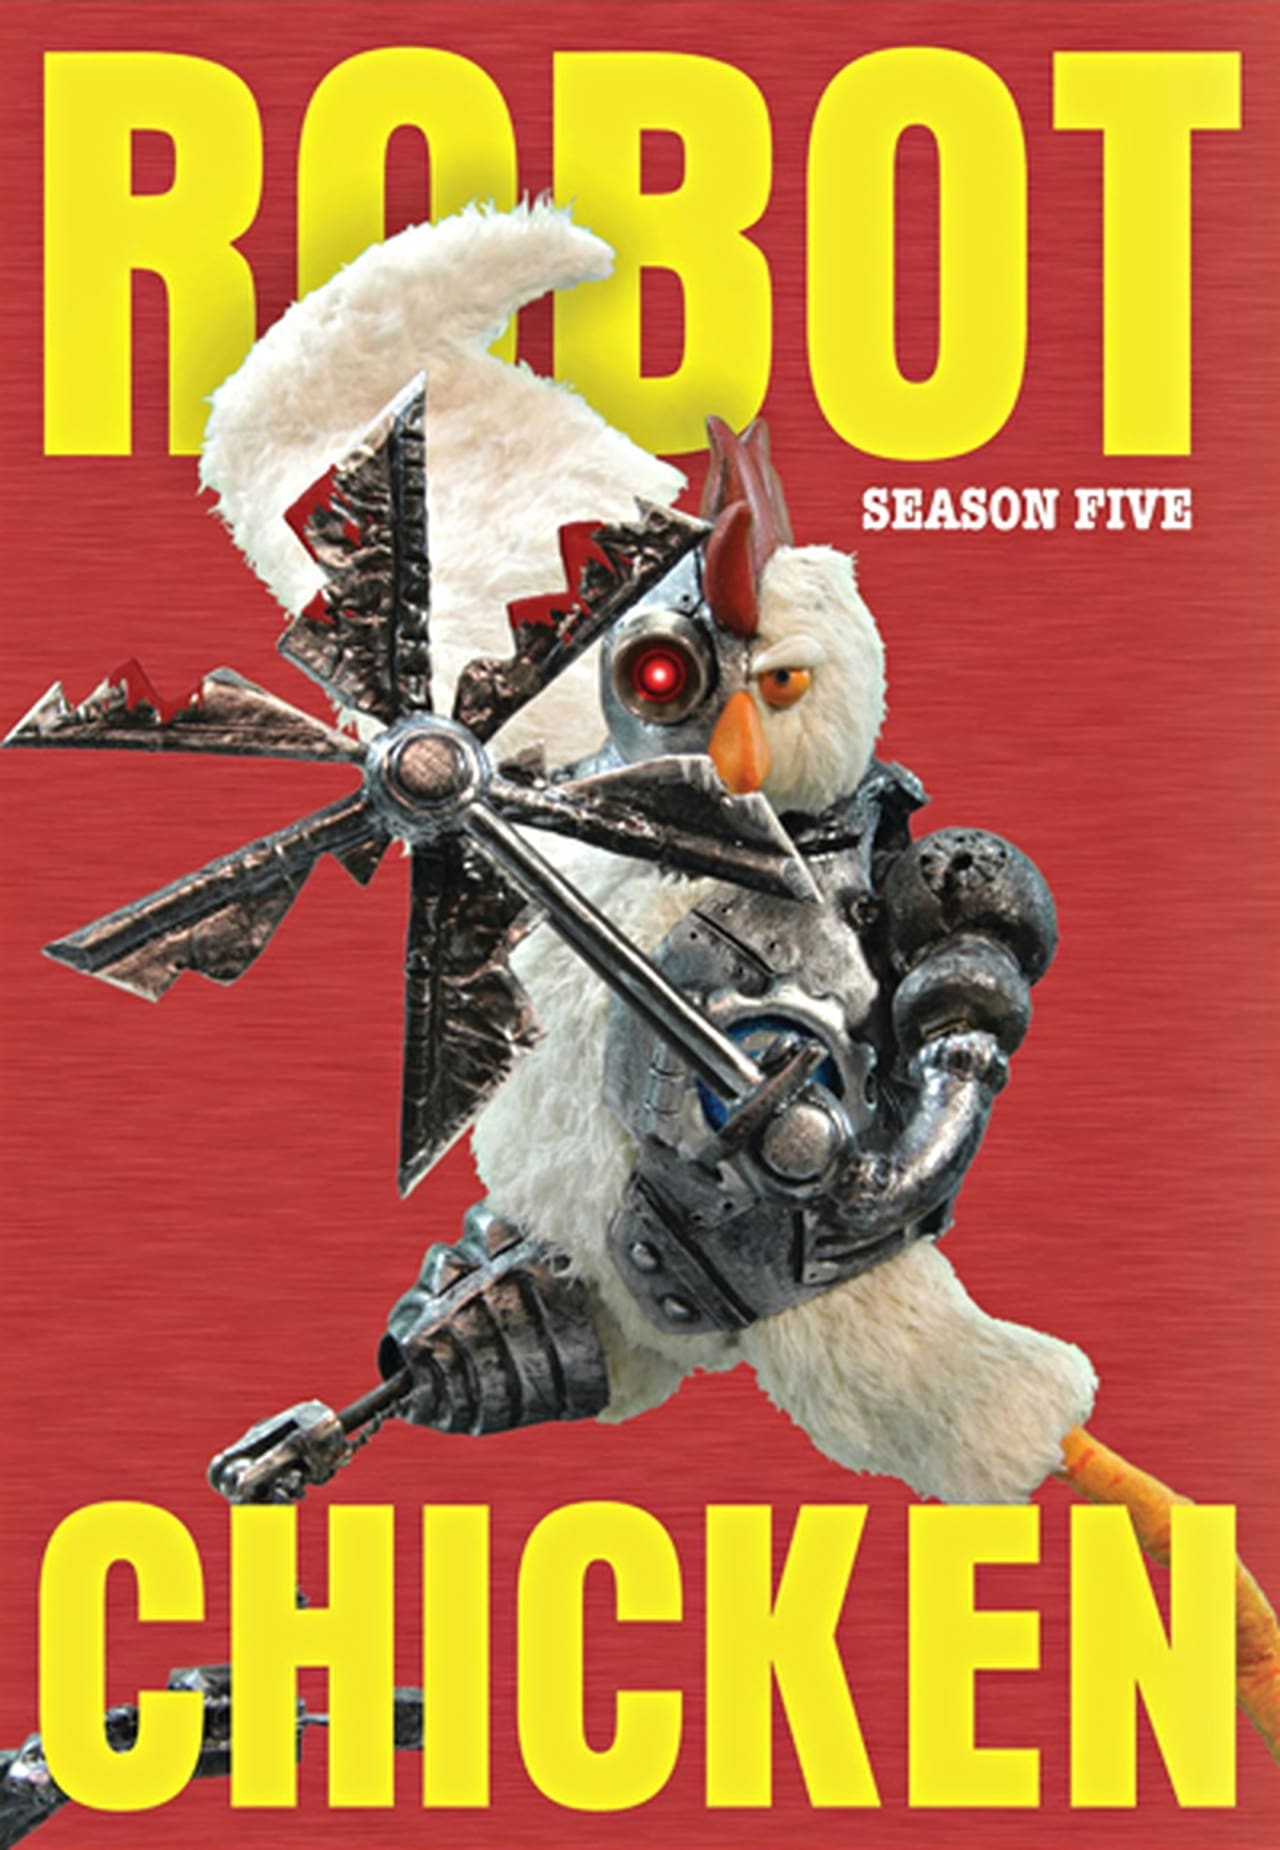 Robot Chicken Season 5 (2011) putlockers cafe